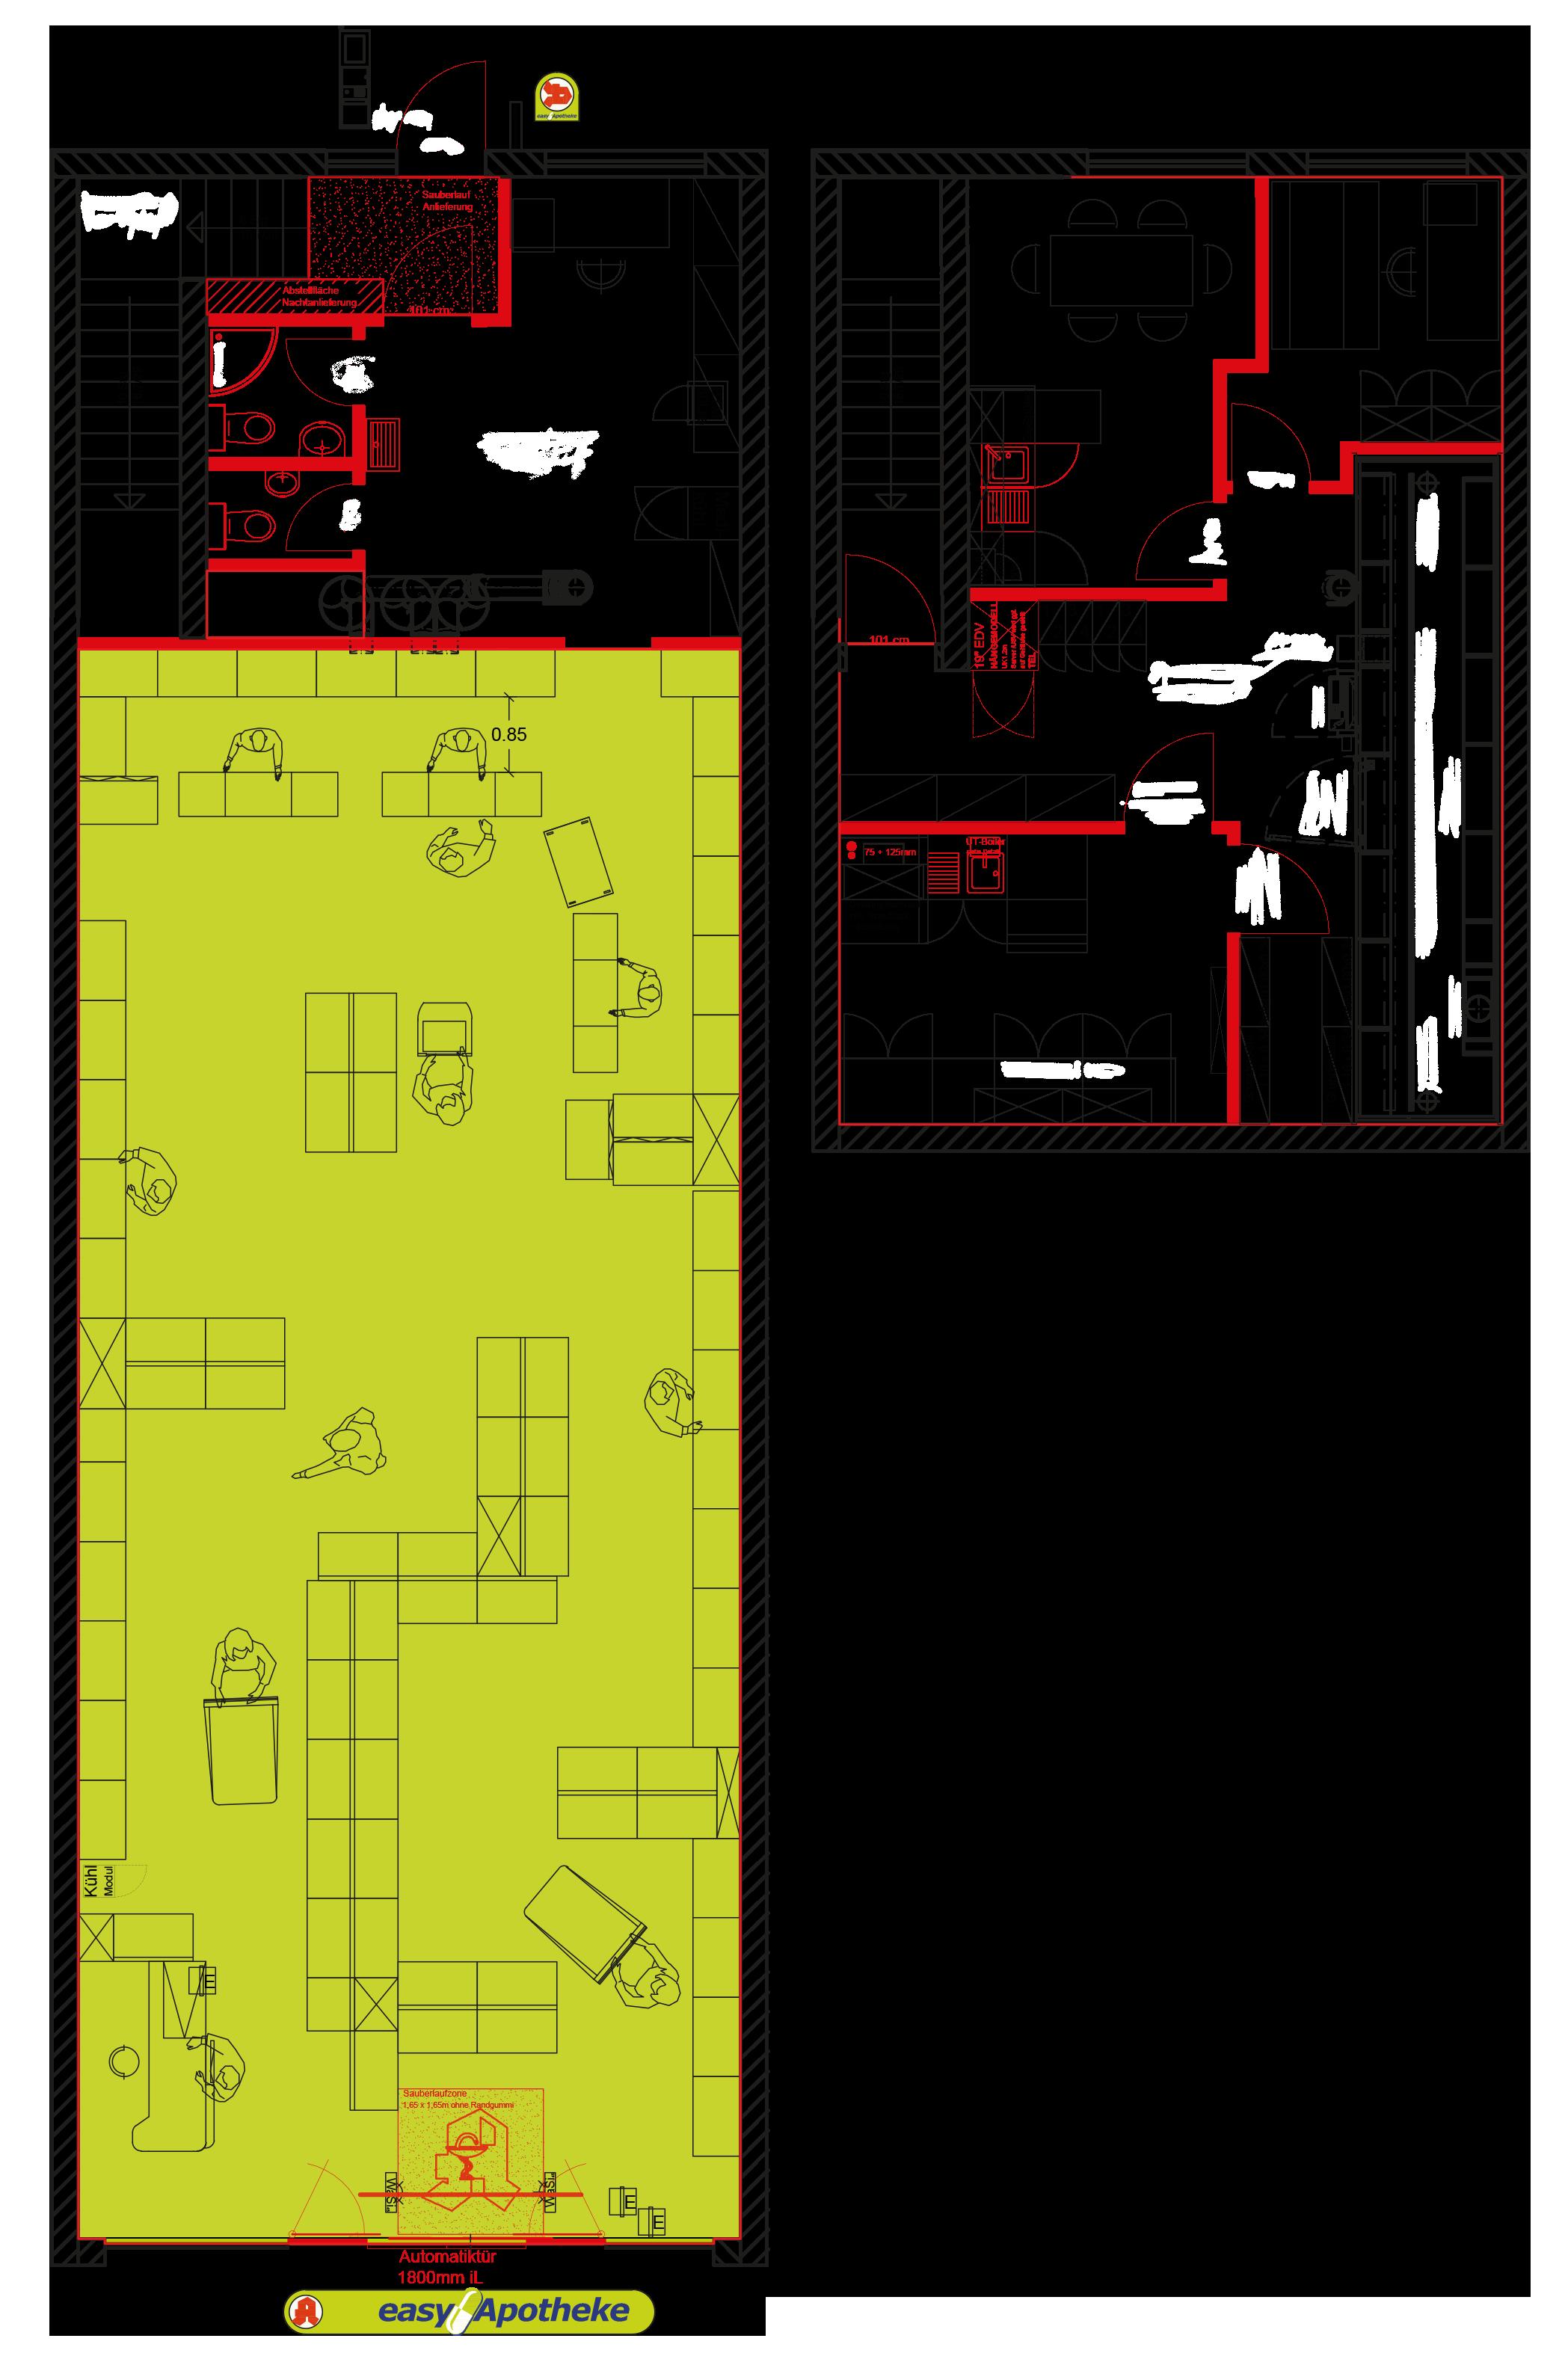 easyApotheke - Standort anbieten - Vorkassenzonen - Mustergrundriss